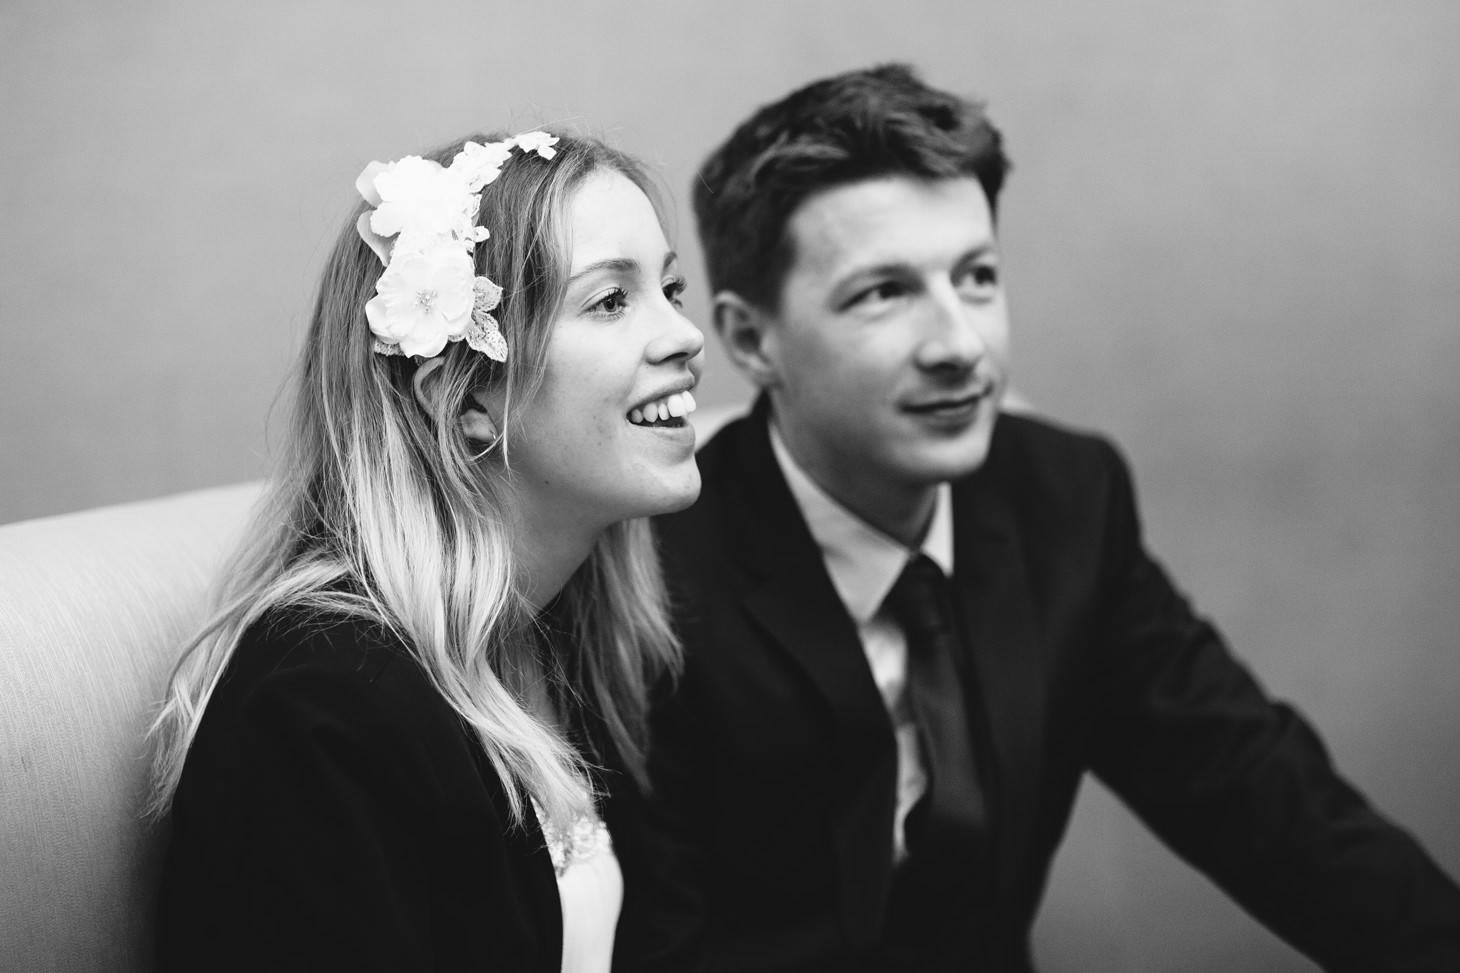 nyc-wedding-photographer-brooklyn-bridge-smitten-chickens-photo021.jpg